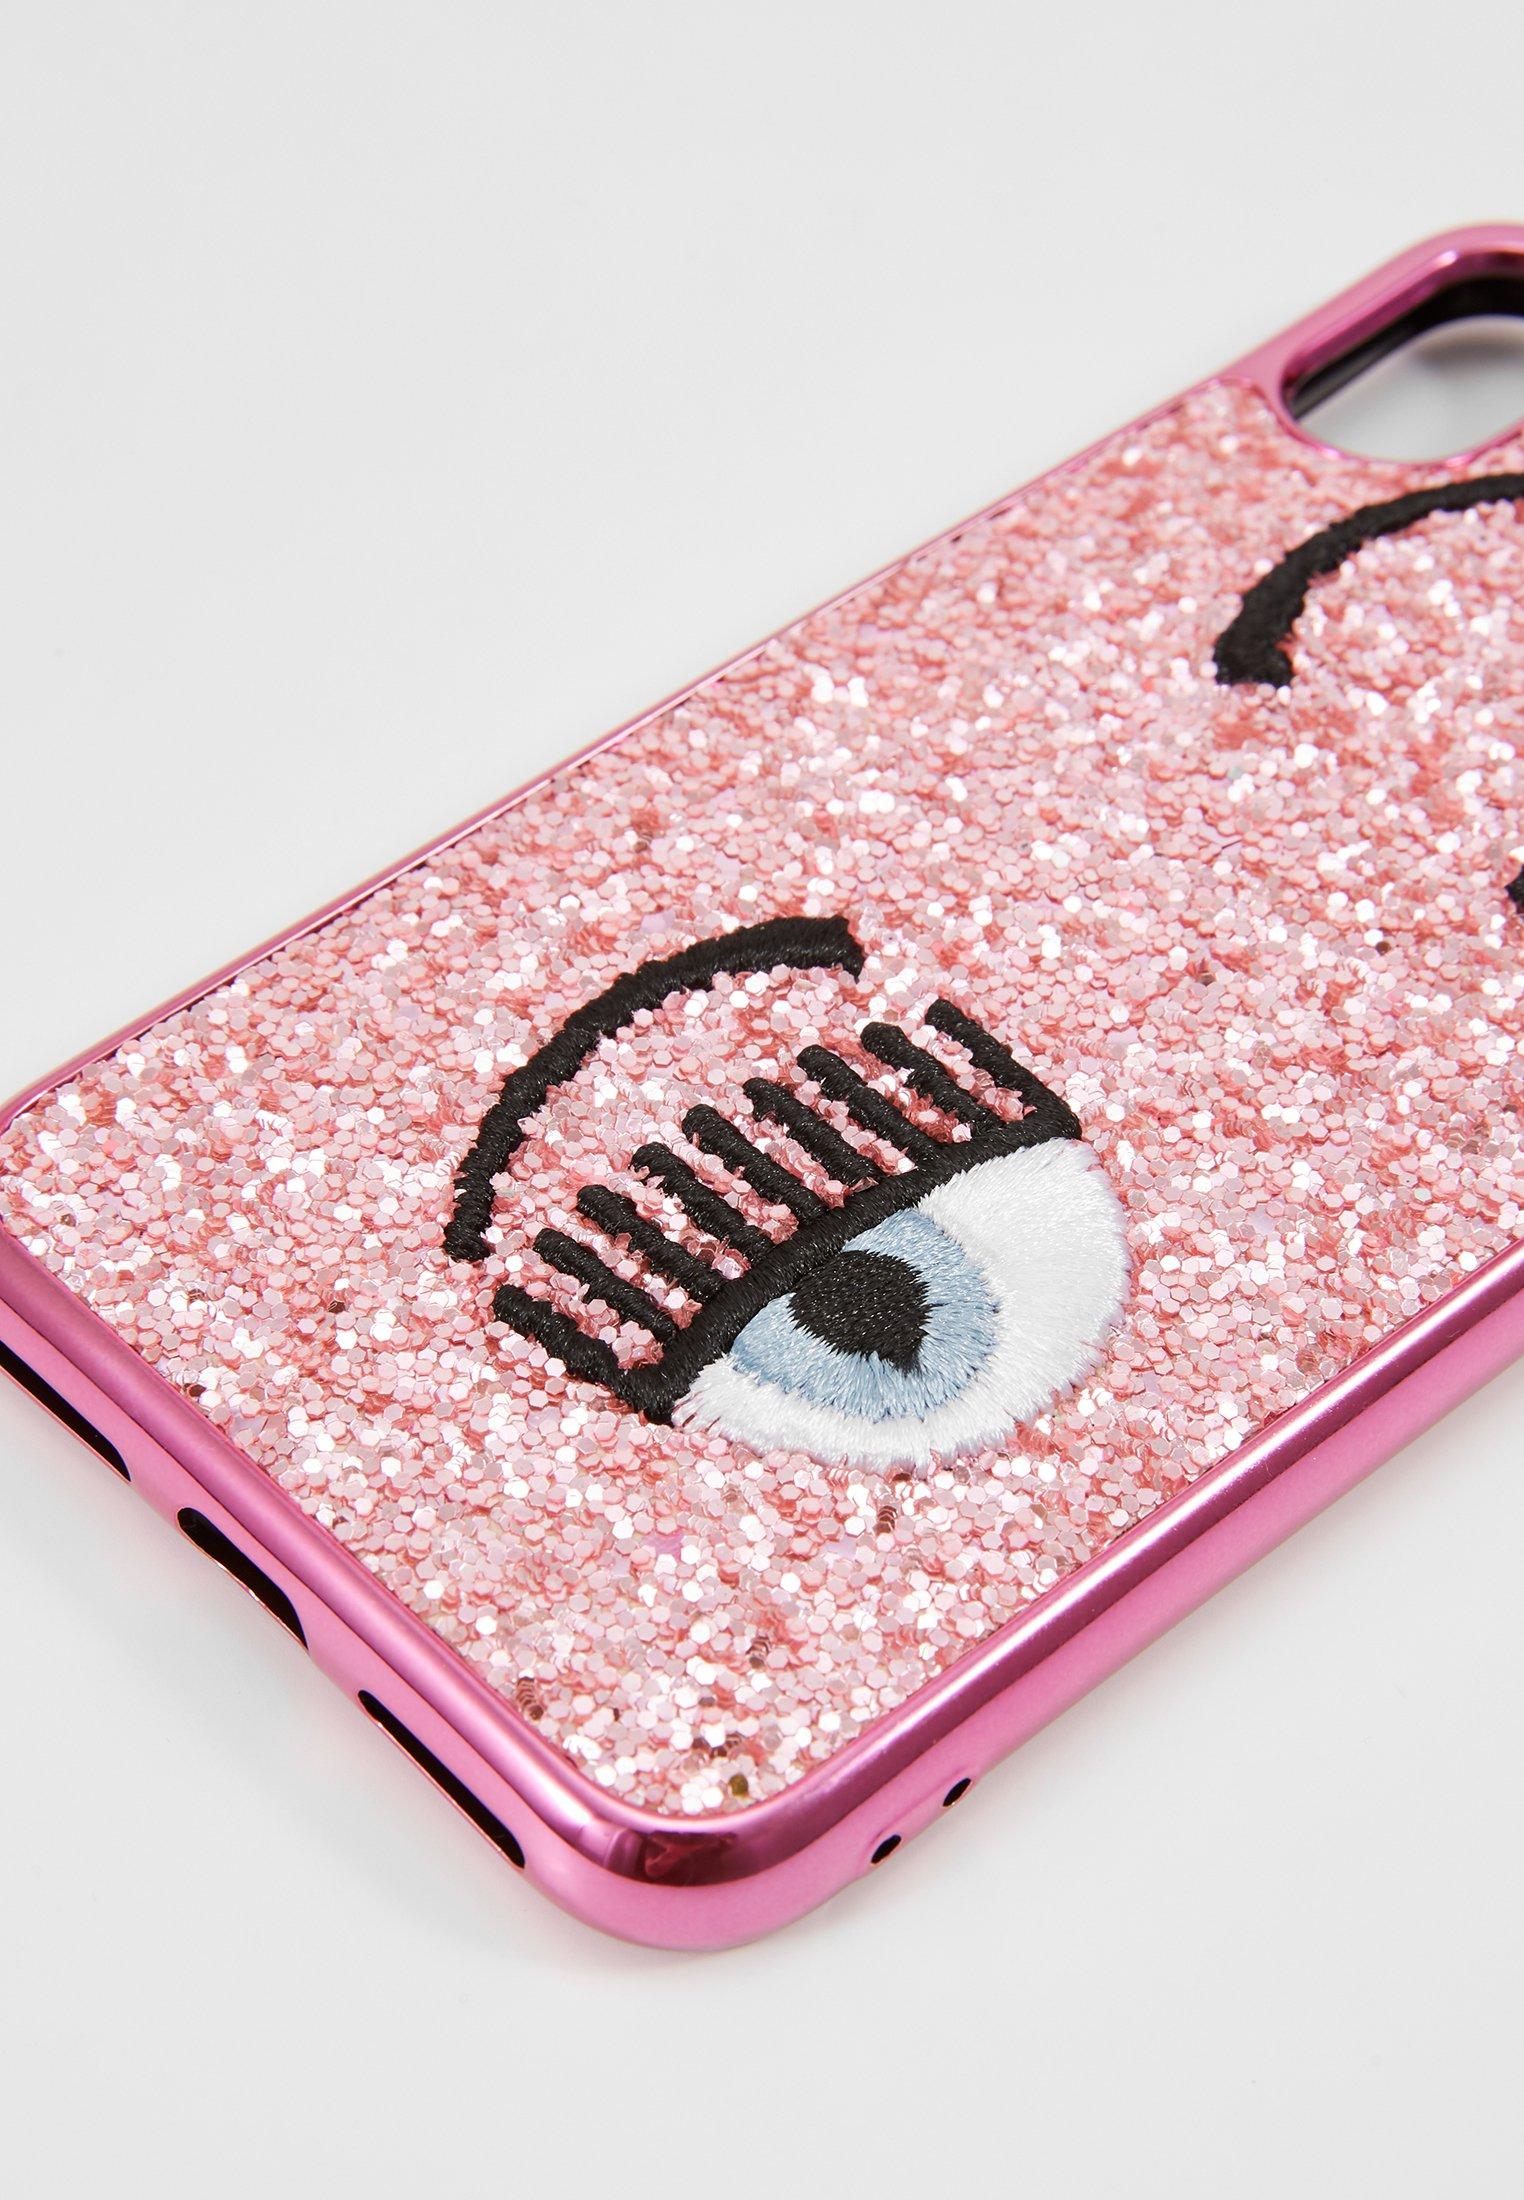 Chiara Cover À Portable Flirting Pink GlitterÉtui Ferragni OP0kwn